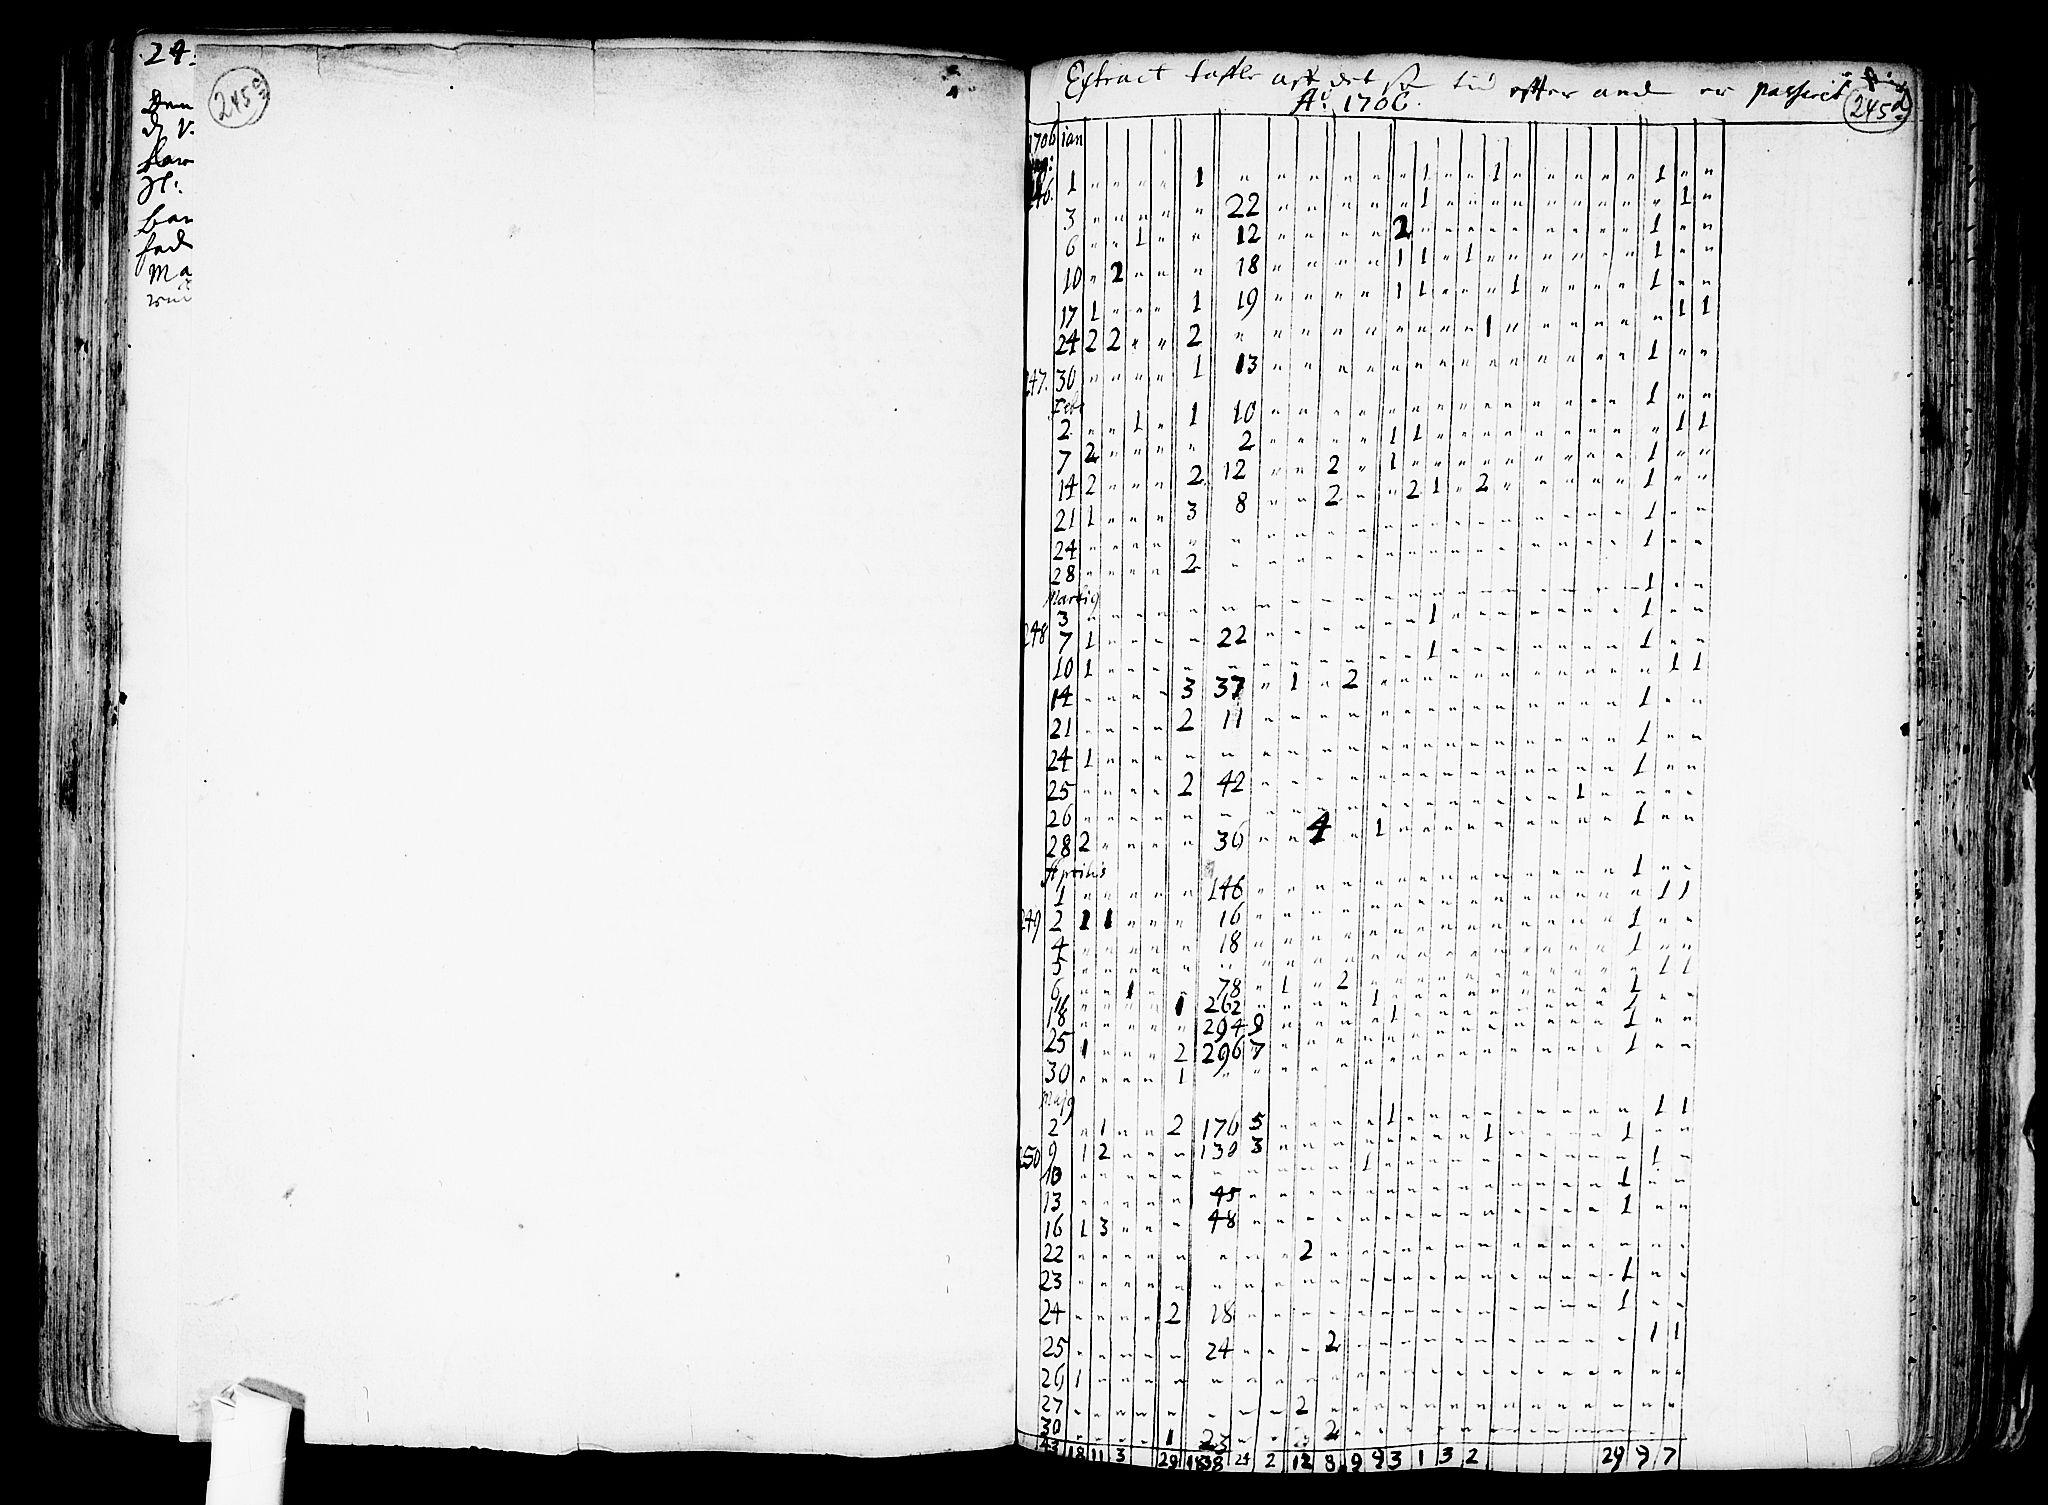 SAO, Nes prestekontor Kirkebøker, F/Fa/L0001: Parish register (official) no. I 1, 1689-1716, p. 245d